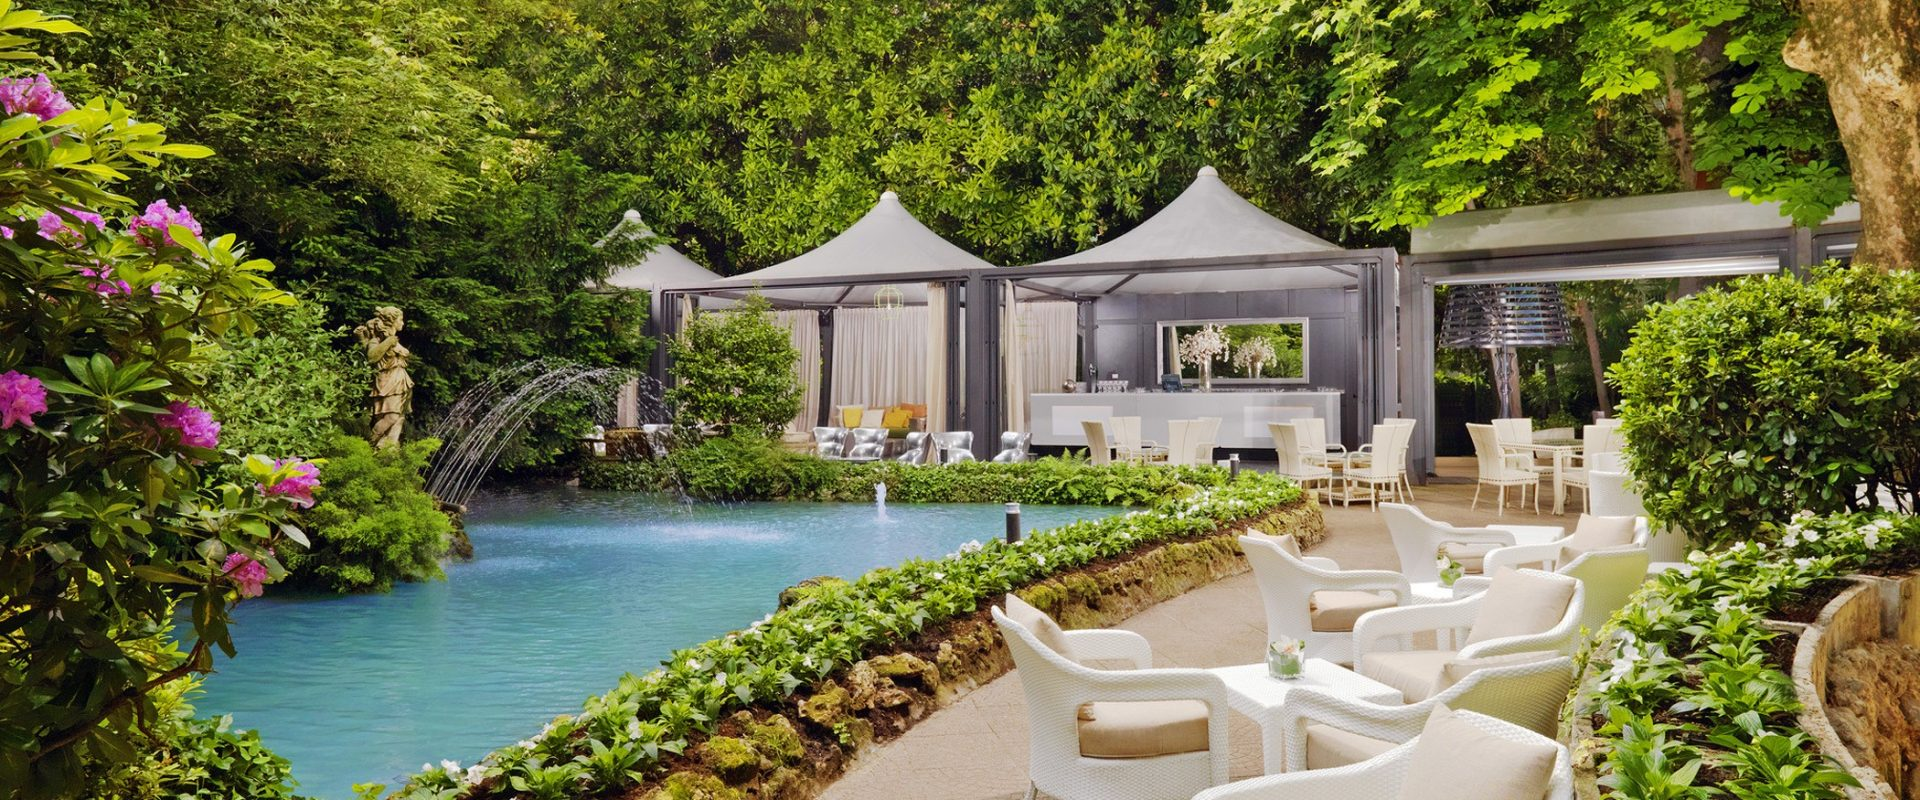 Explore-Italy-Hotel-milan-Sheraton-Diana-Majestic-Milan-Pool